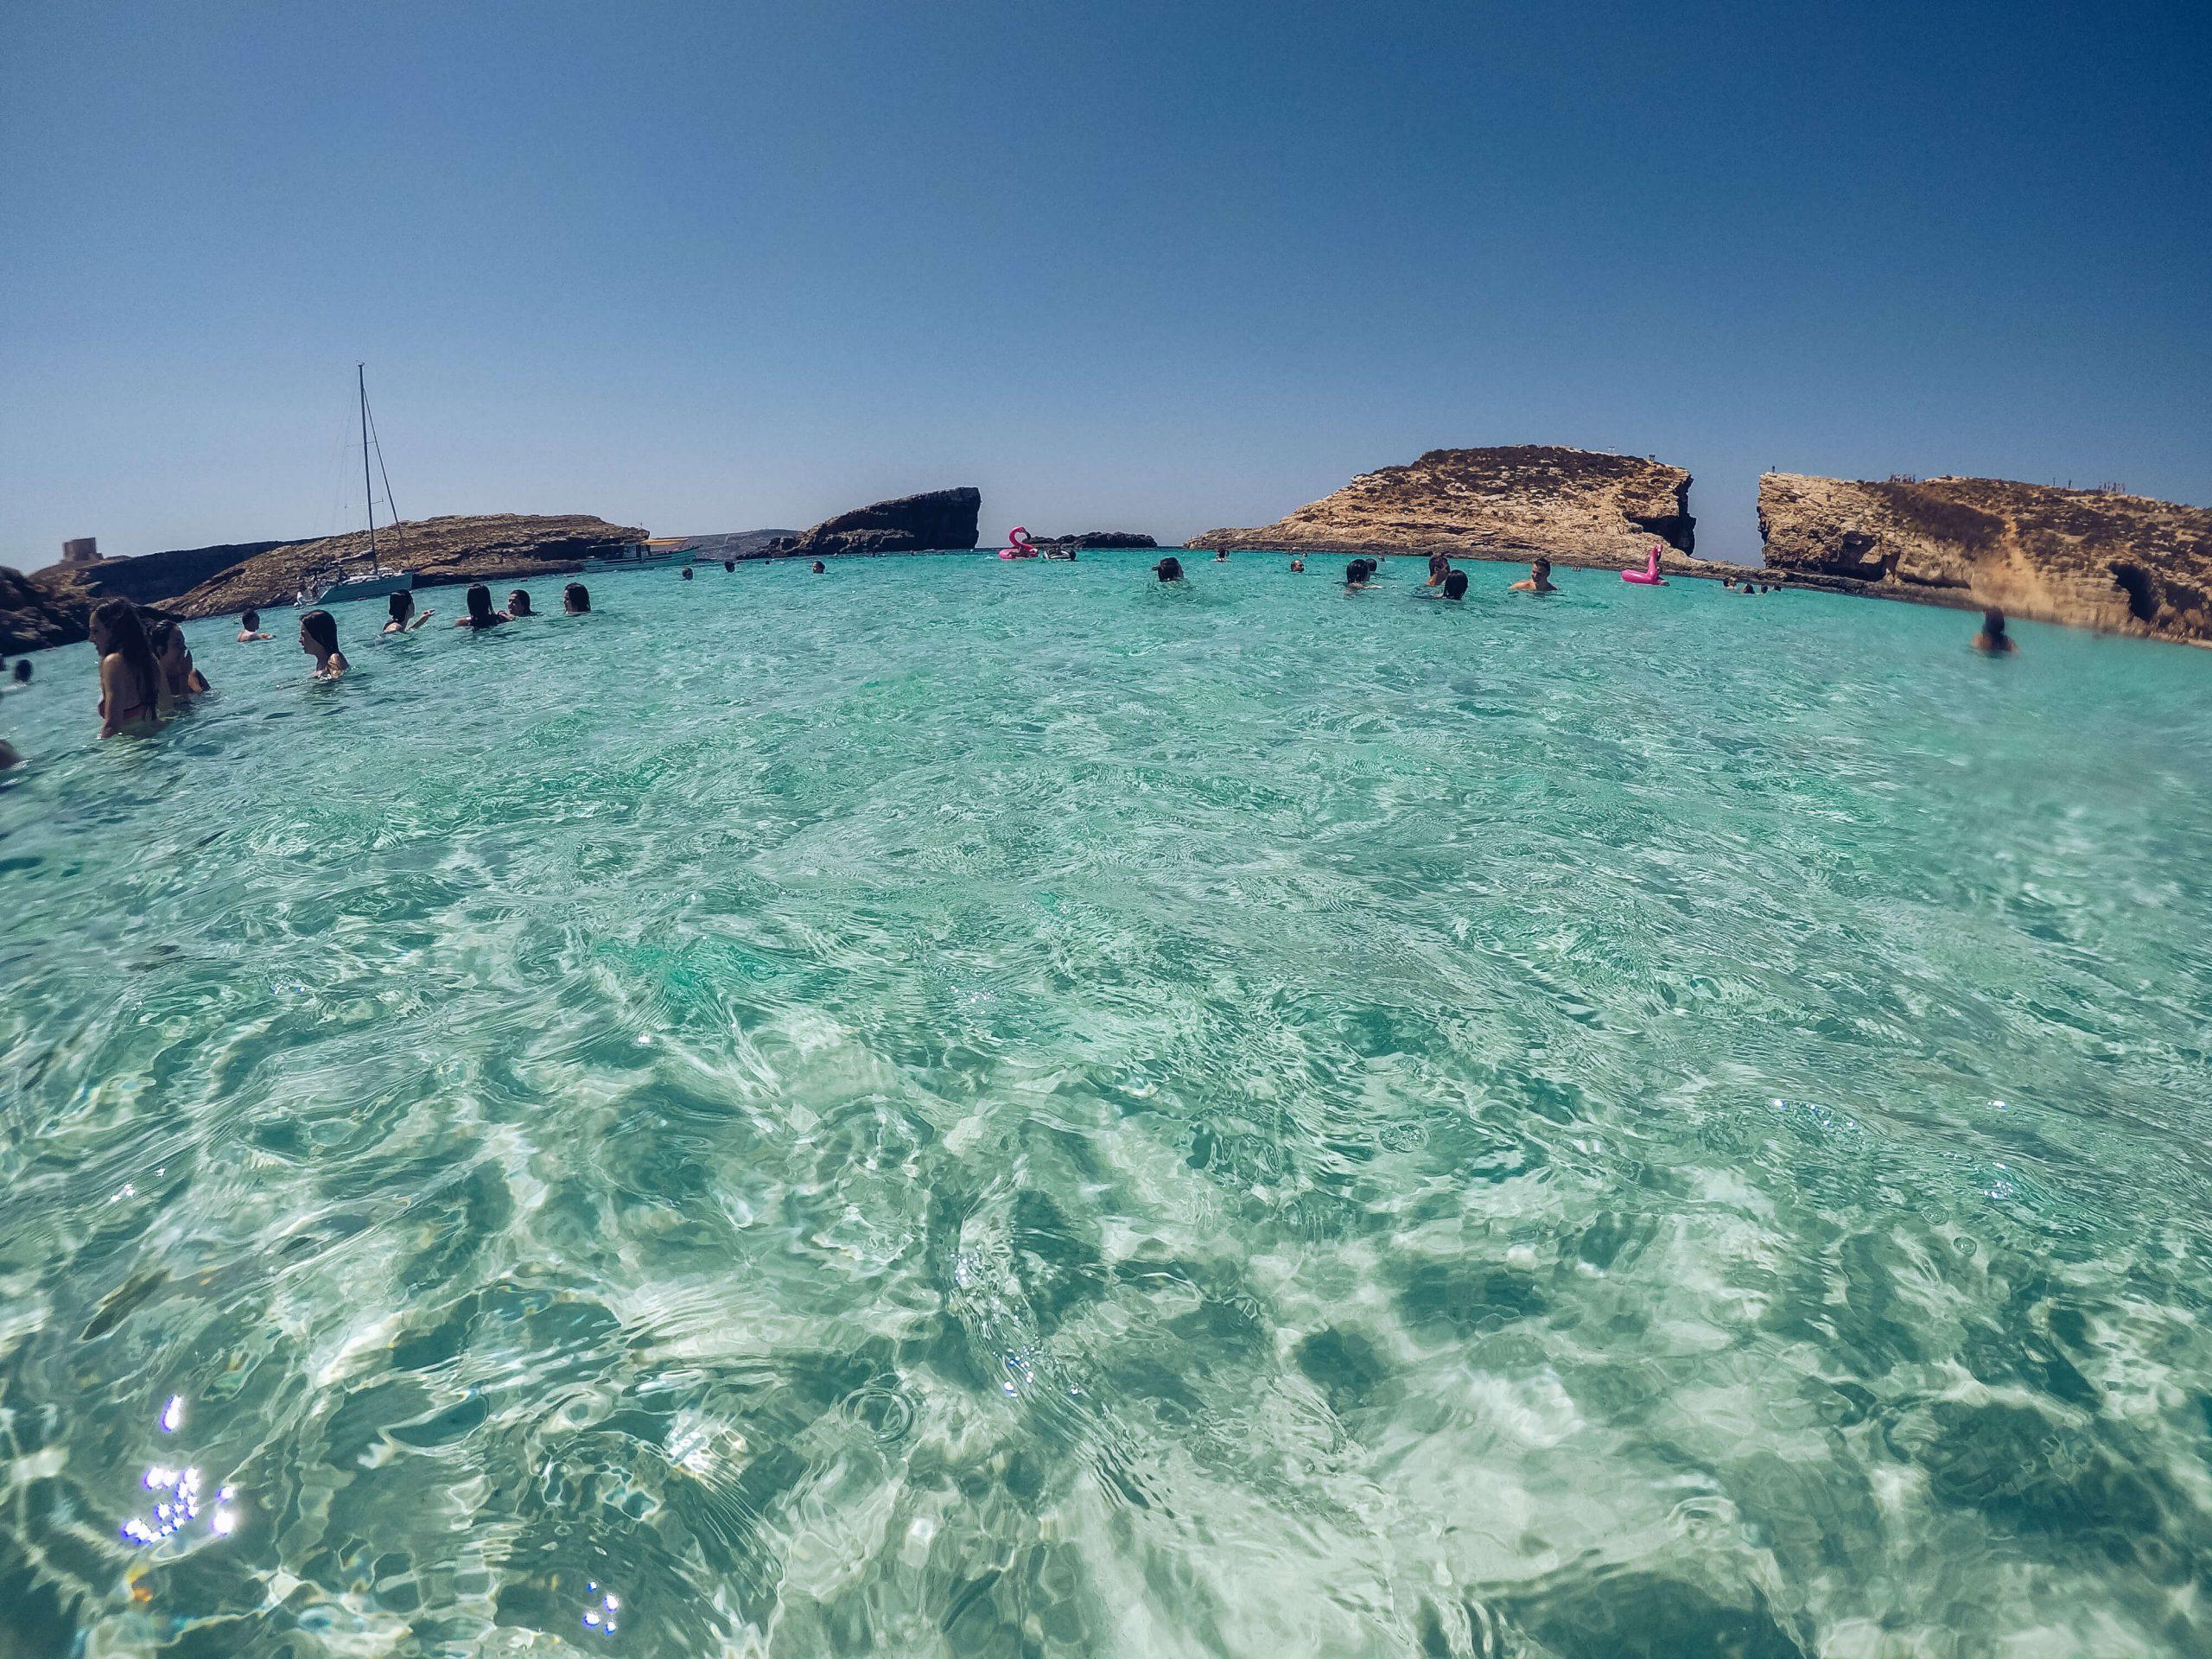 Outdoor explorers Malta Gozo Comino Boat tour Blue lagoon